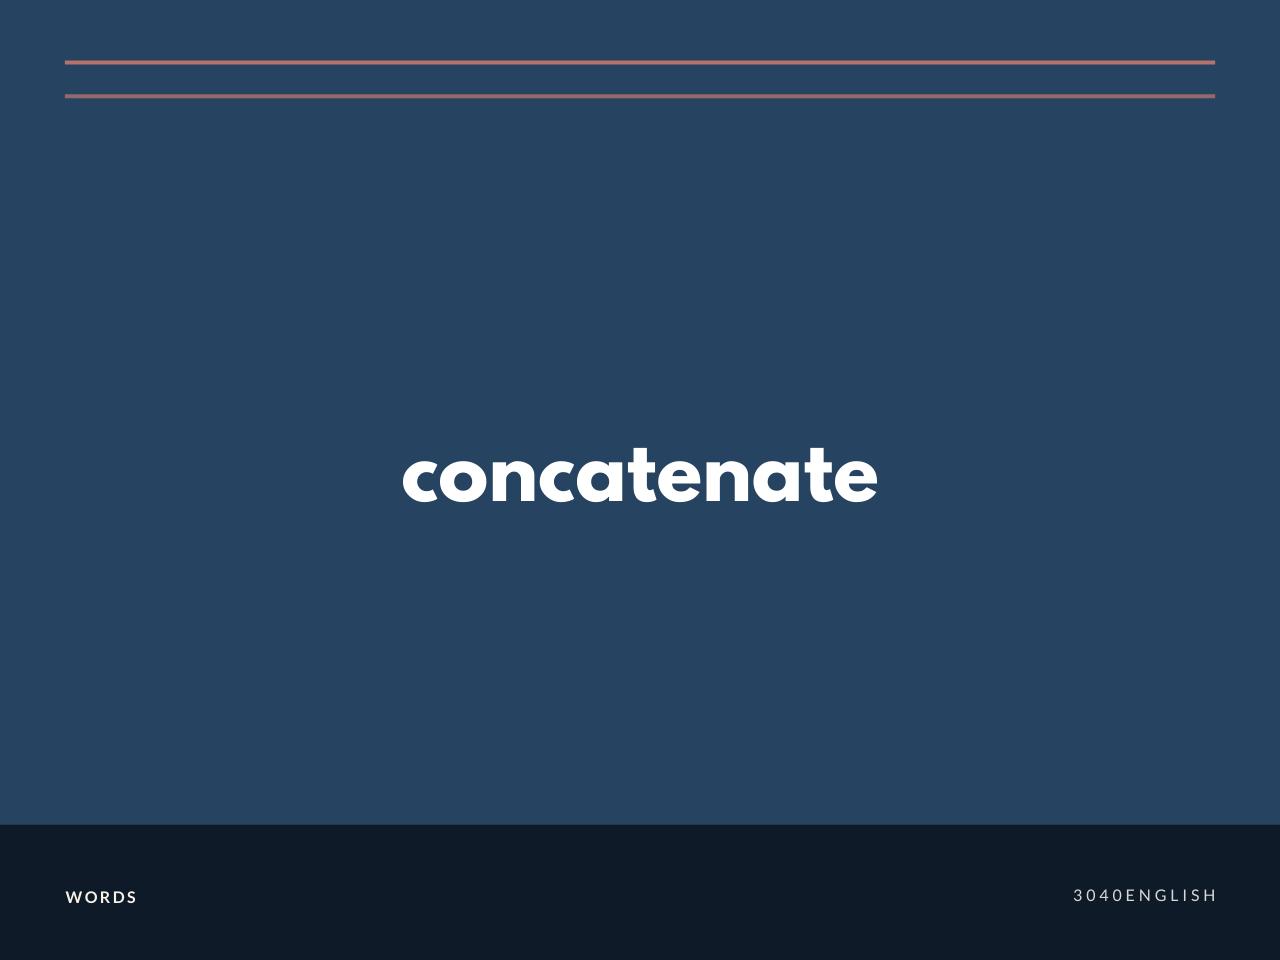 concatenate の意味と簡単な使い方【音読用例文あり】